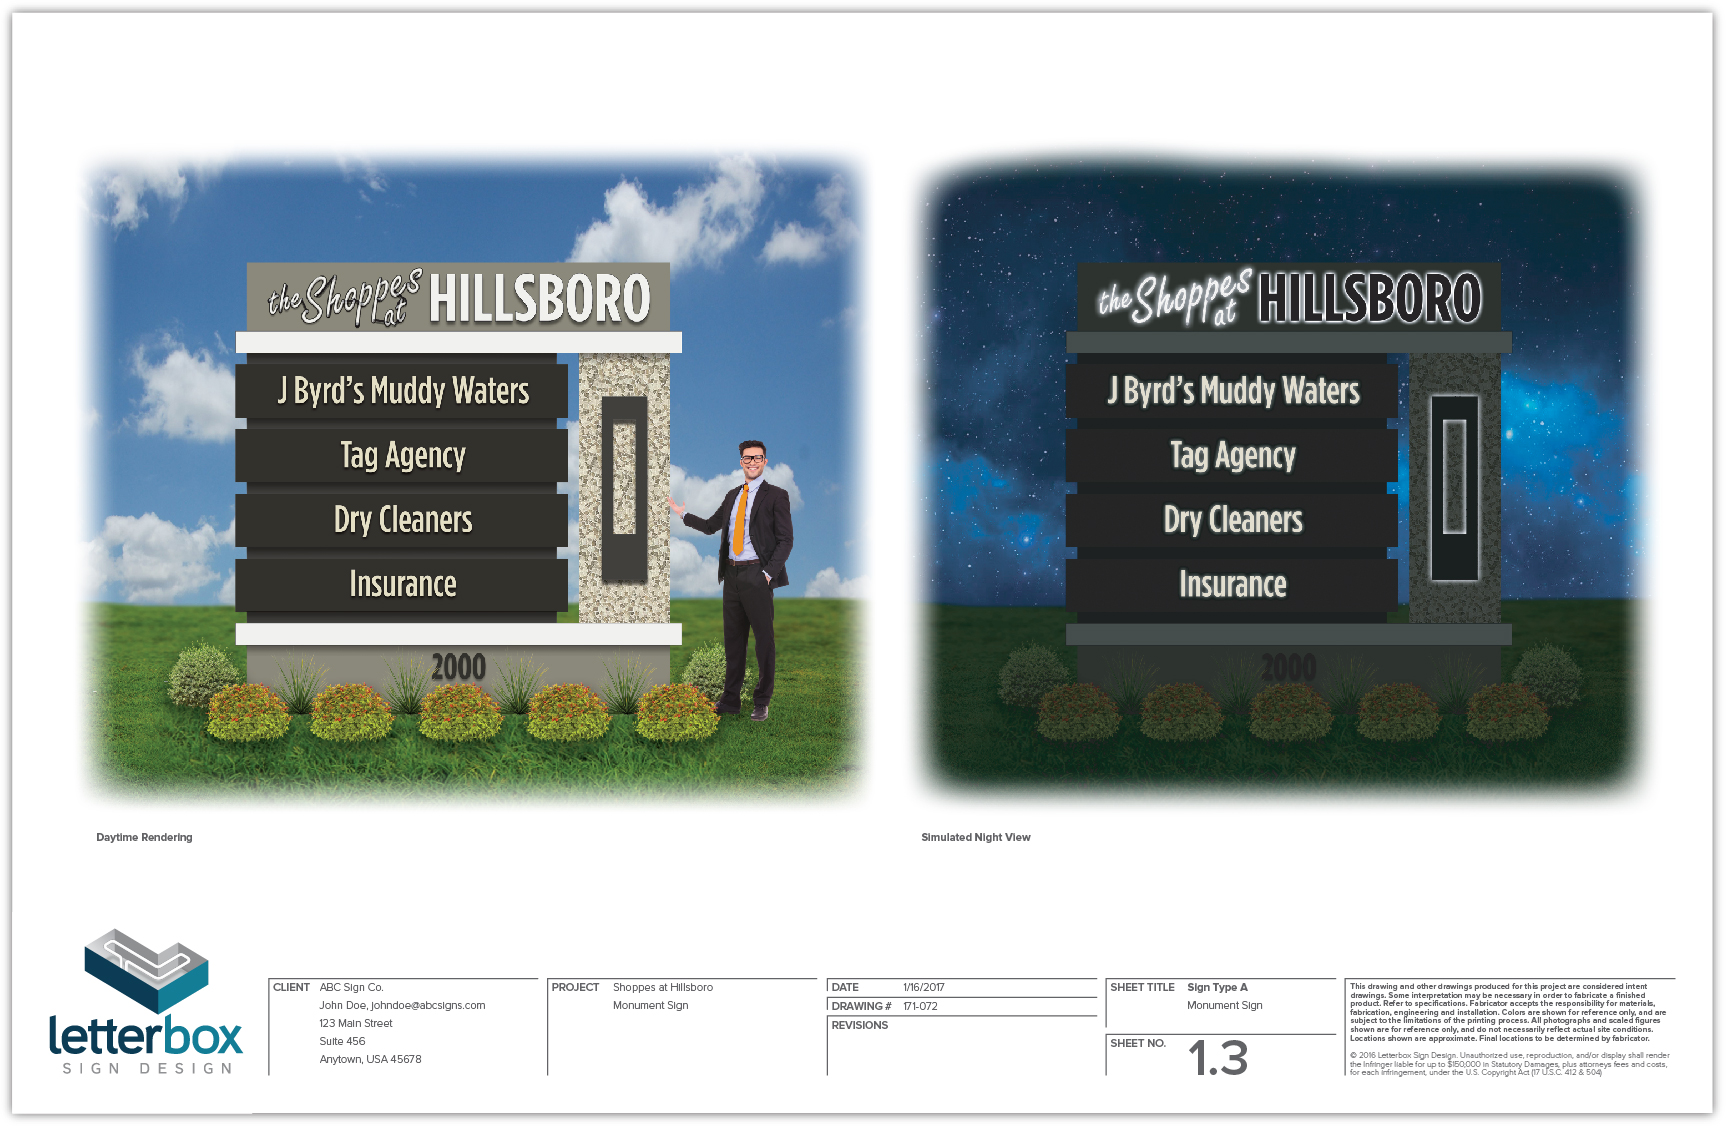 Hillsboro renderings-01-01.jpg